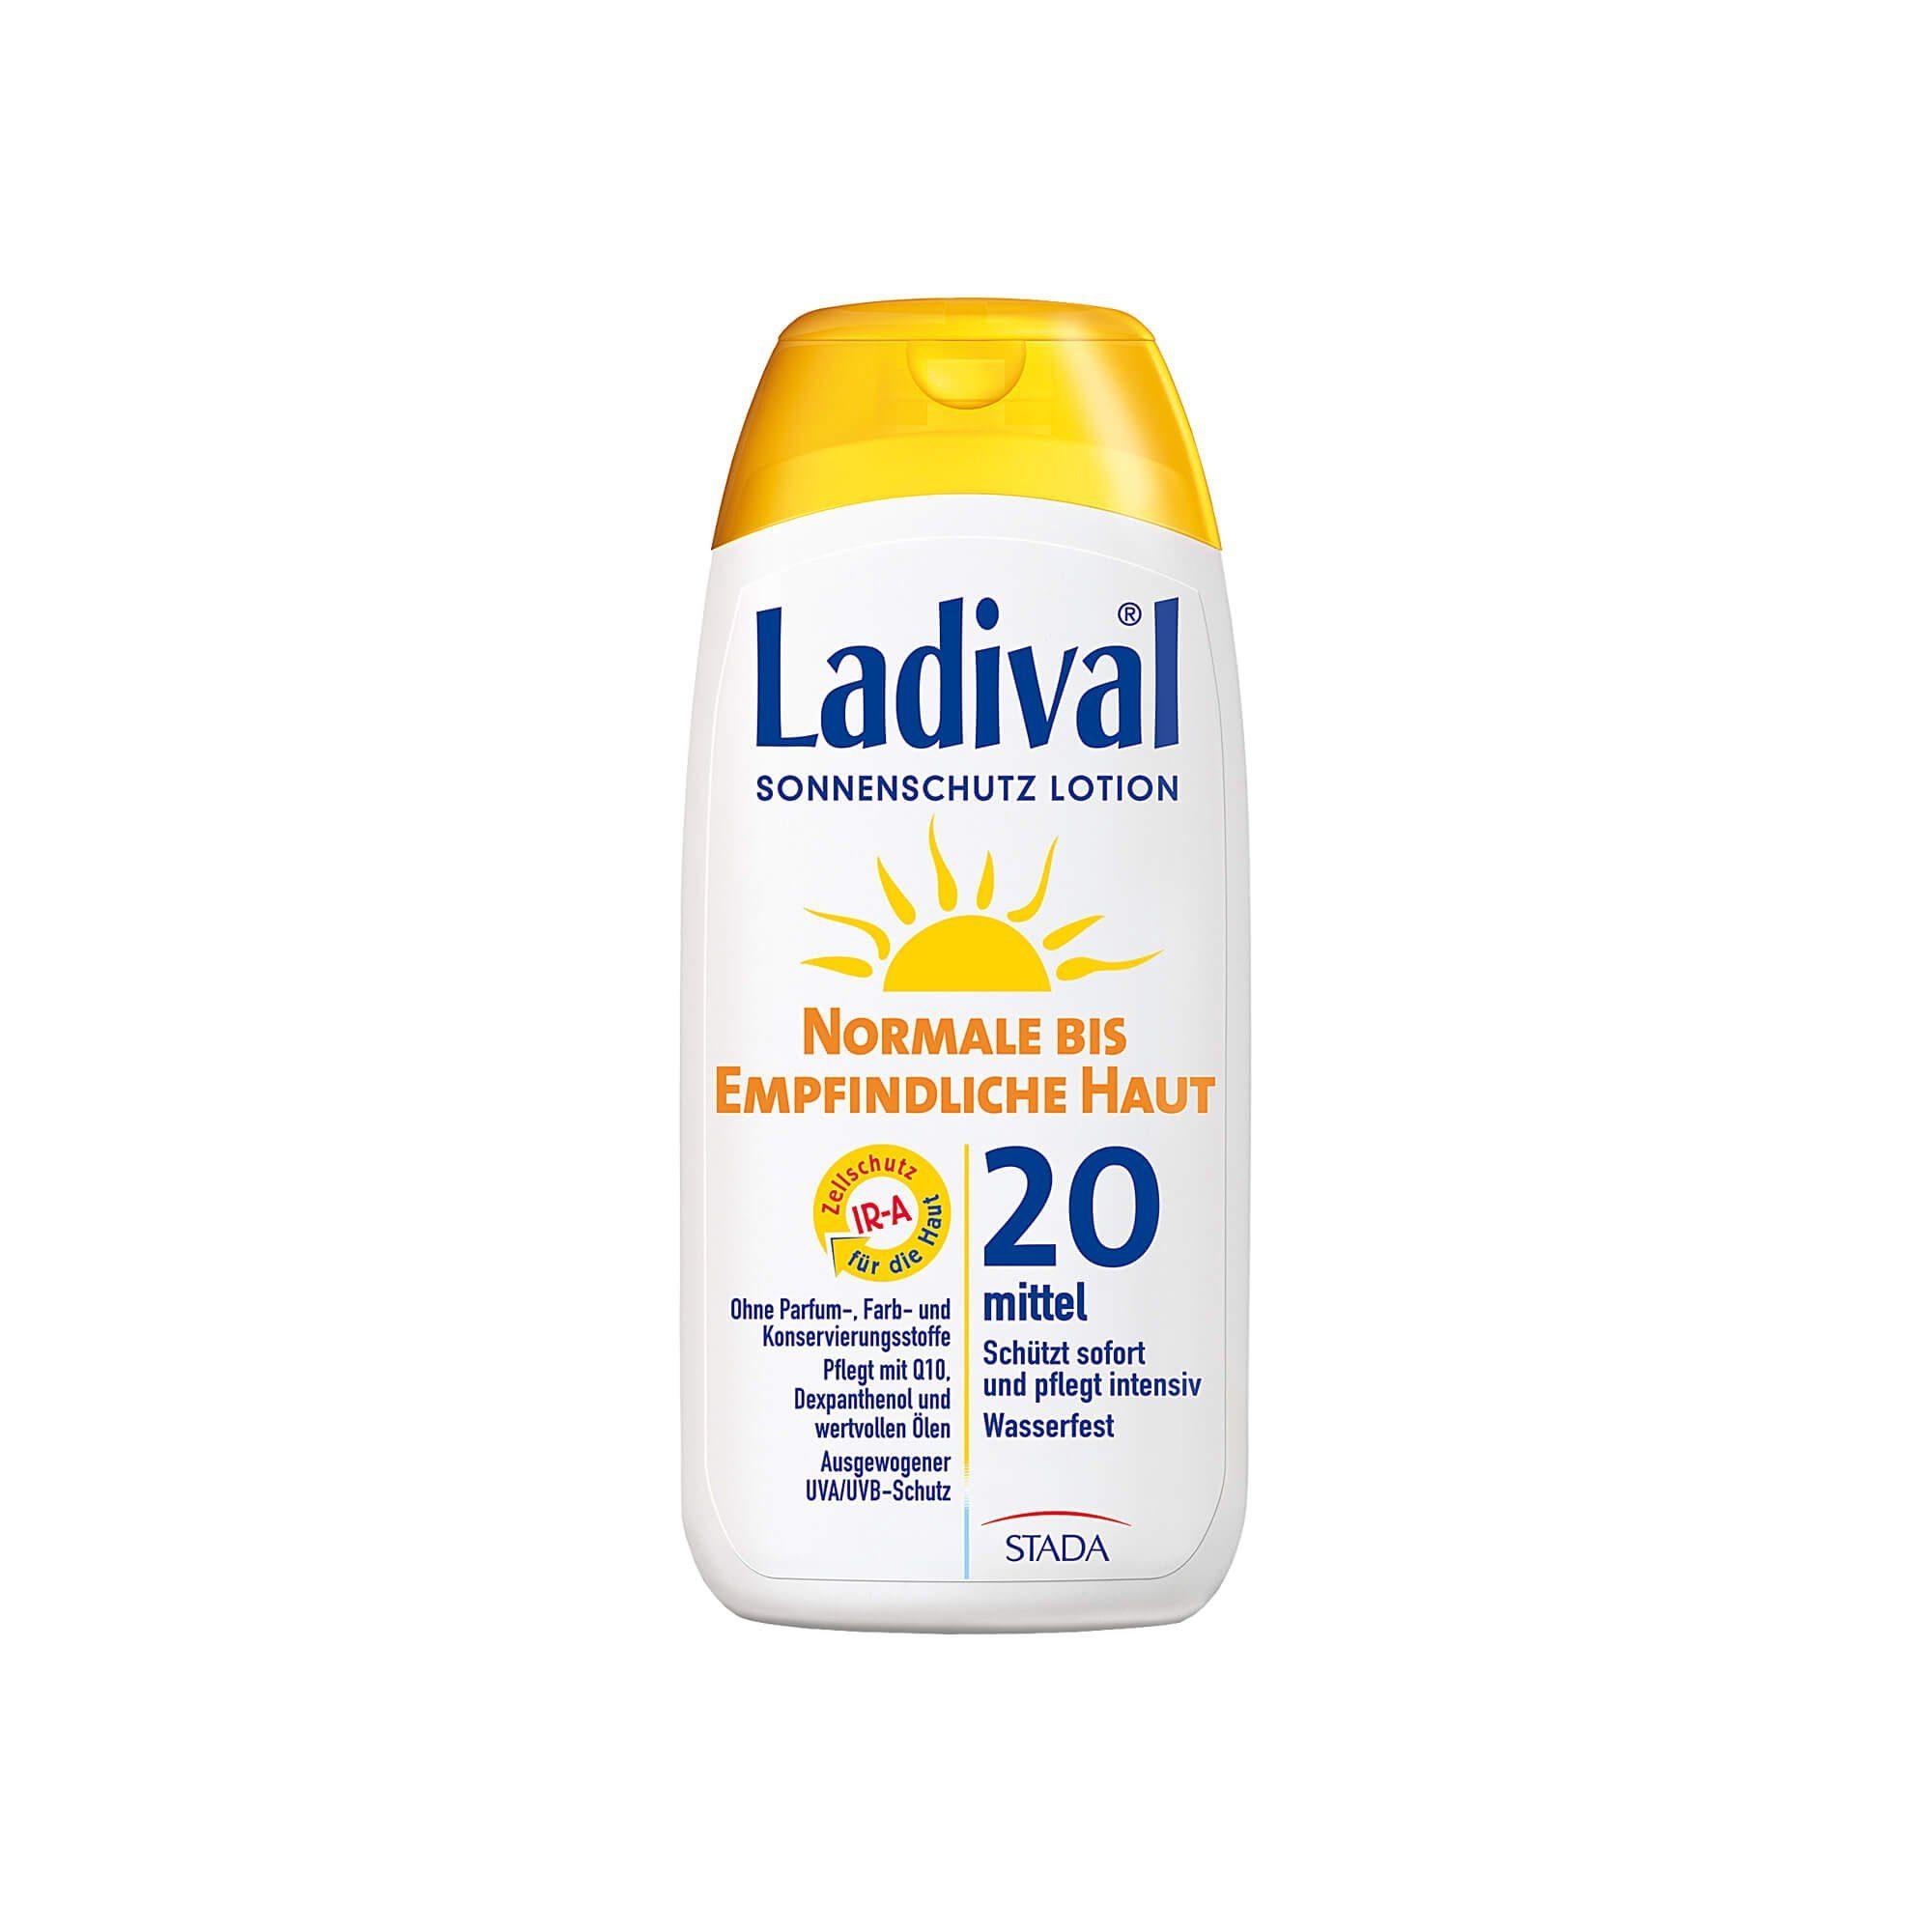 Ladival Normale bis Empfindliche Haut Lotion LSF 20 , 200 ml